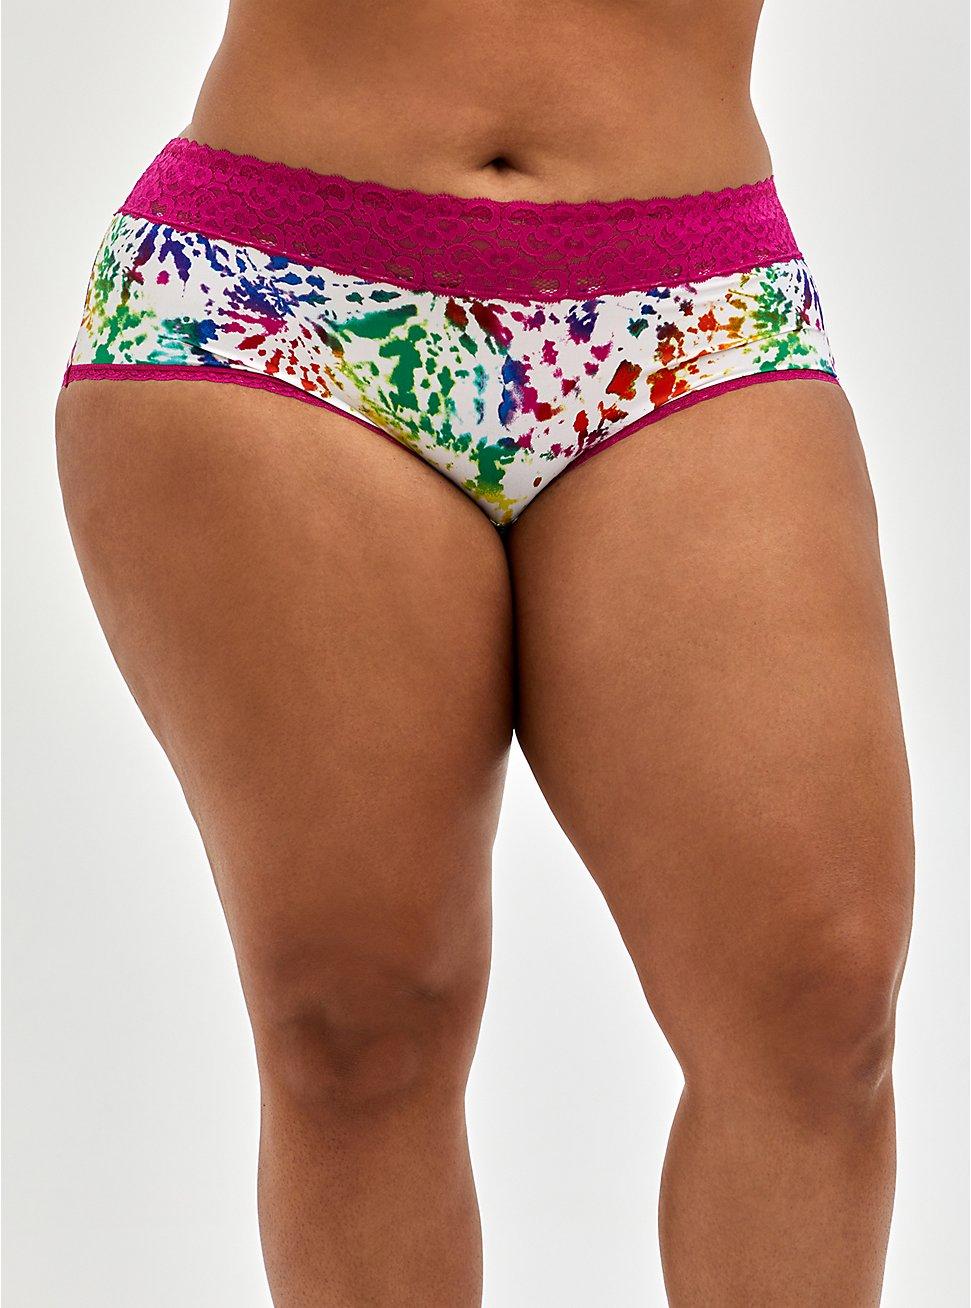 Celebrate Love Cheeky Panty - Second Skin Rainbow Tie Dye , TIE DYE EXPLOSION WHITE, hi-res